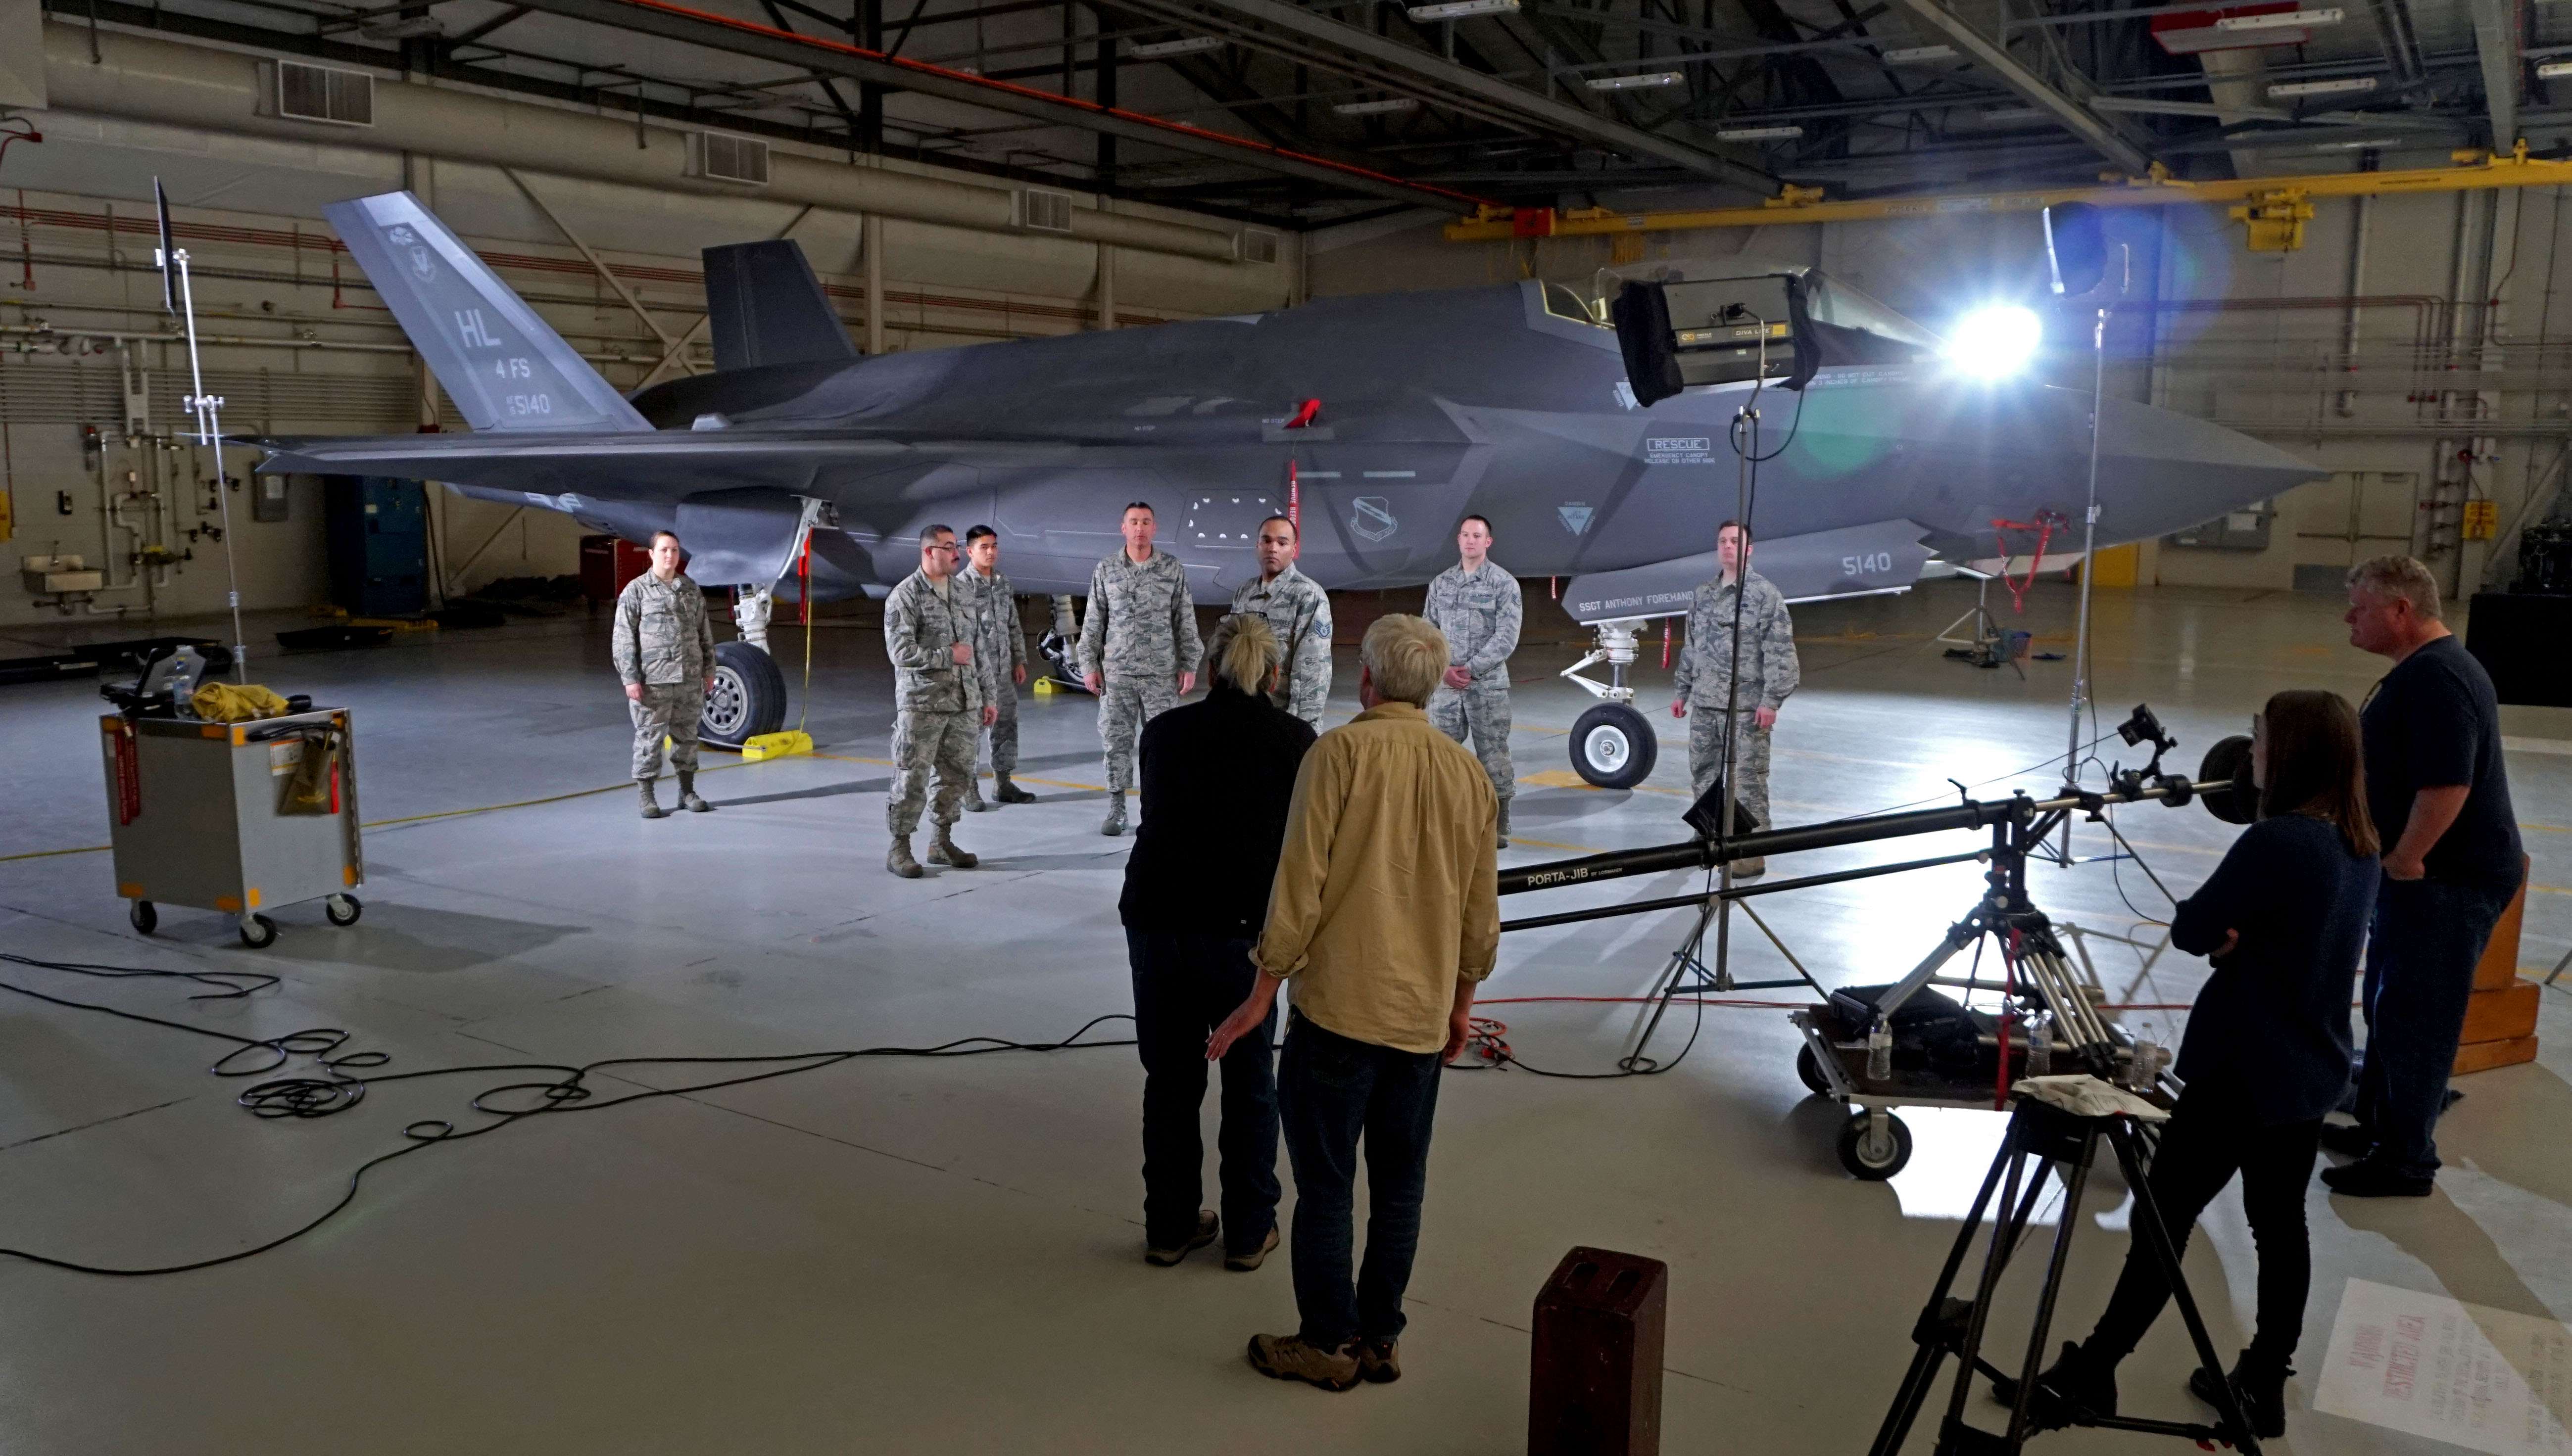 ORIGINAL PATCH Edwards OPERATIONS ENGINEERING USAF 419th FLIGHT TEST SQ